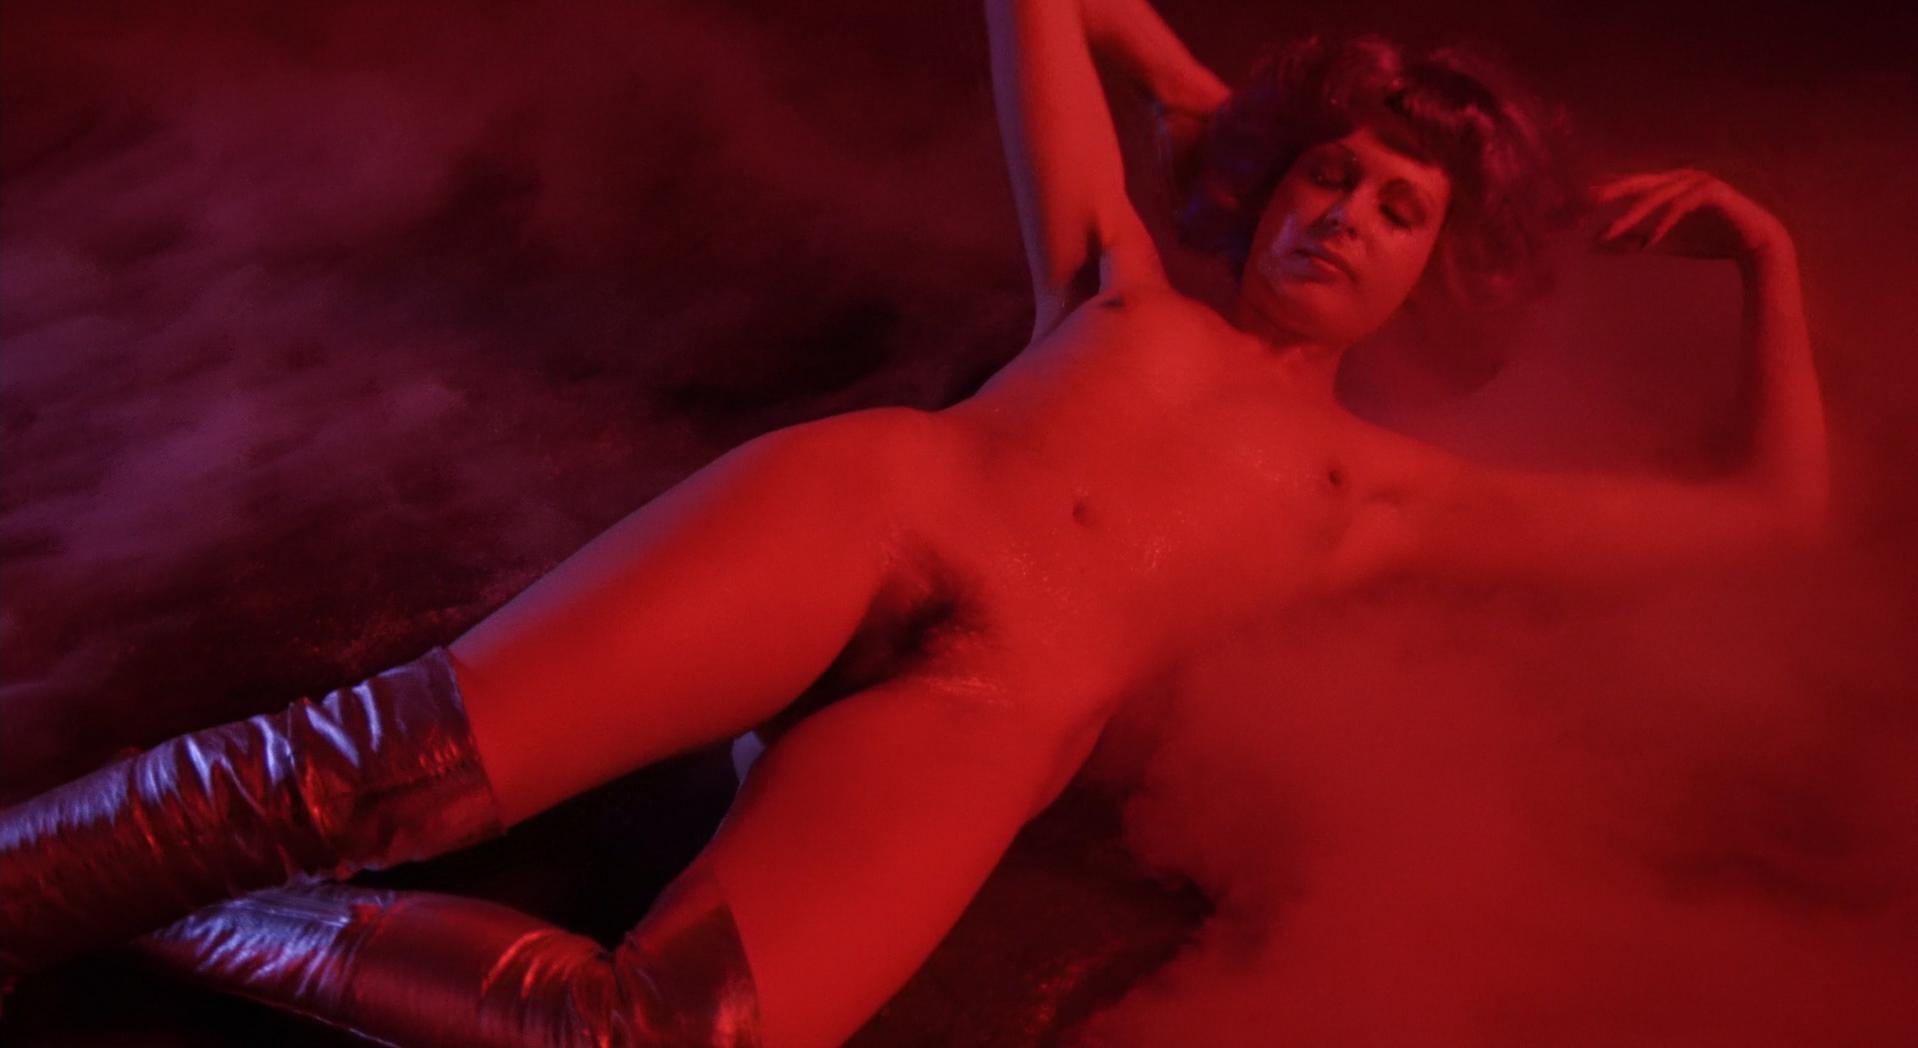 Dagmar Bürger nude, Martine Flety nude - Blue Rita (1977)